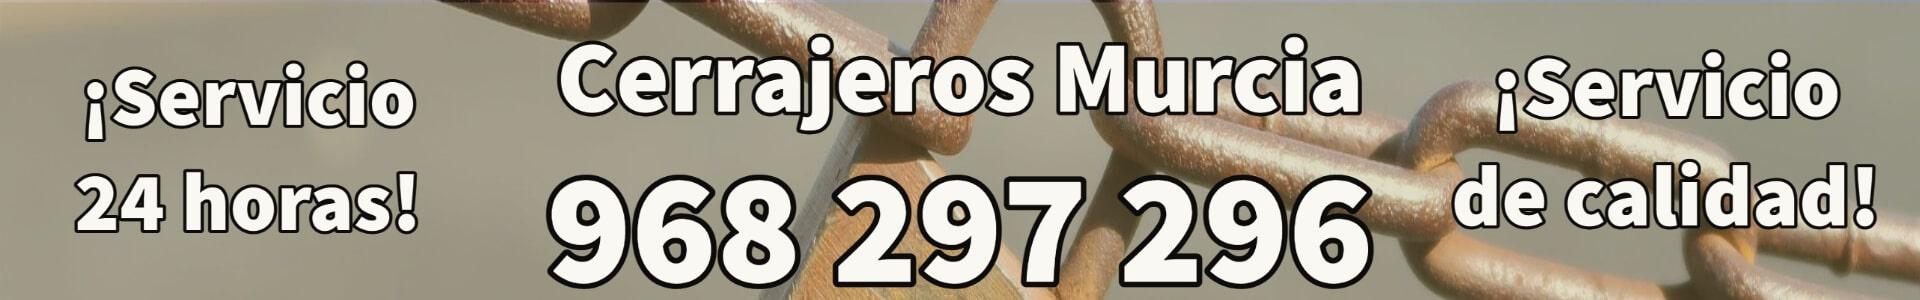 Cerrajeros Murcia